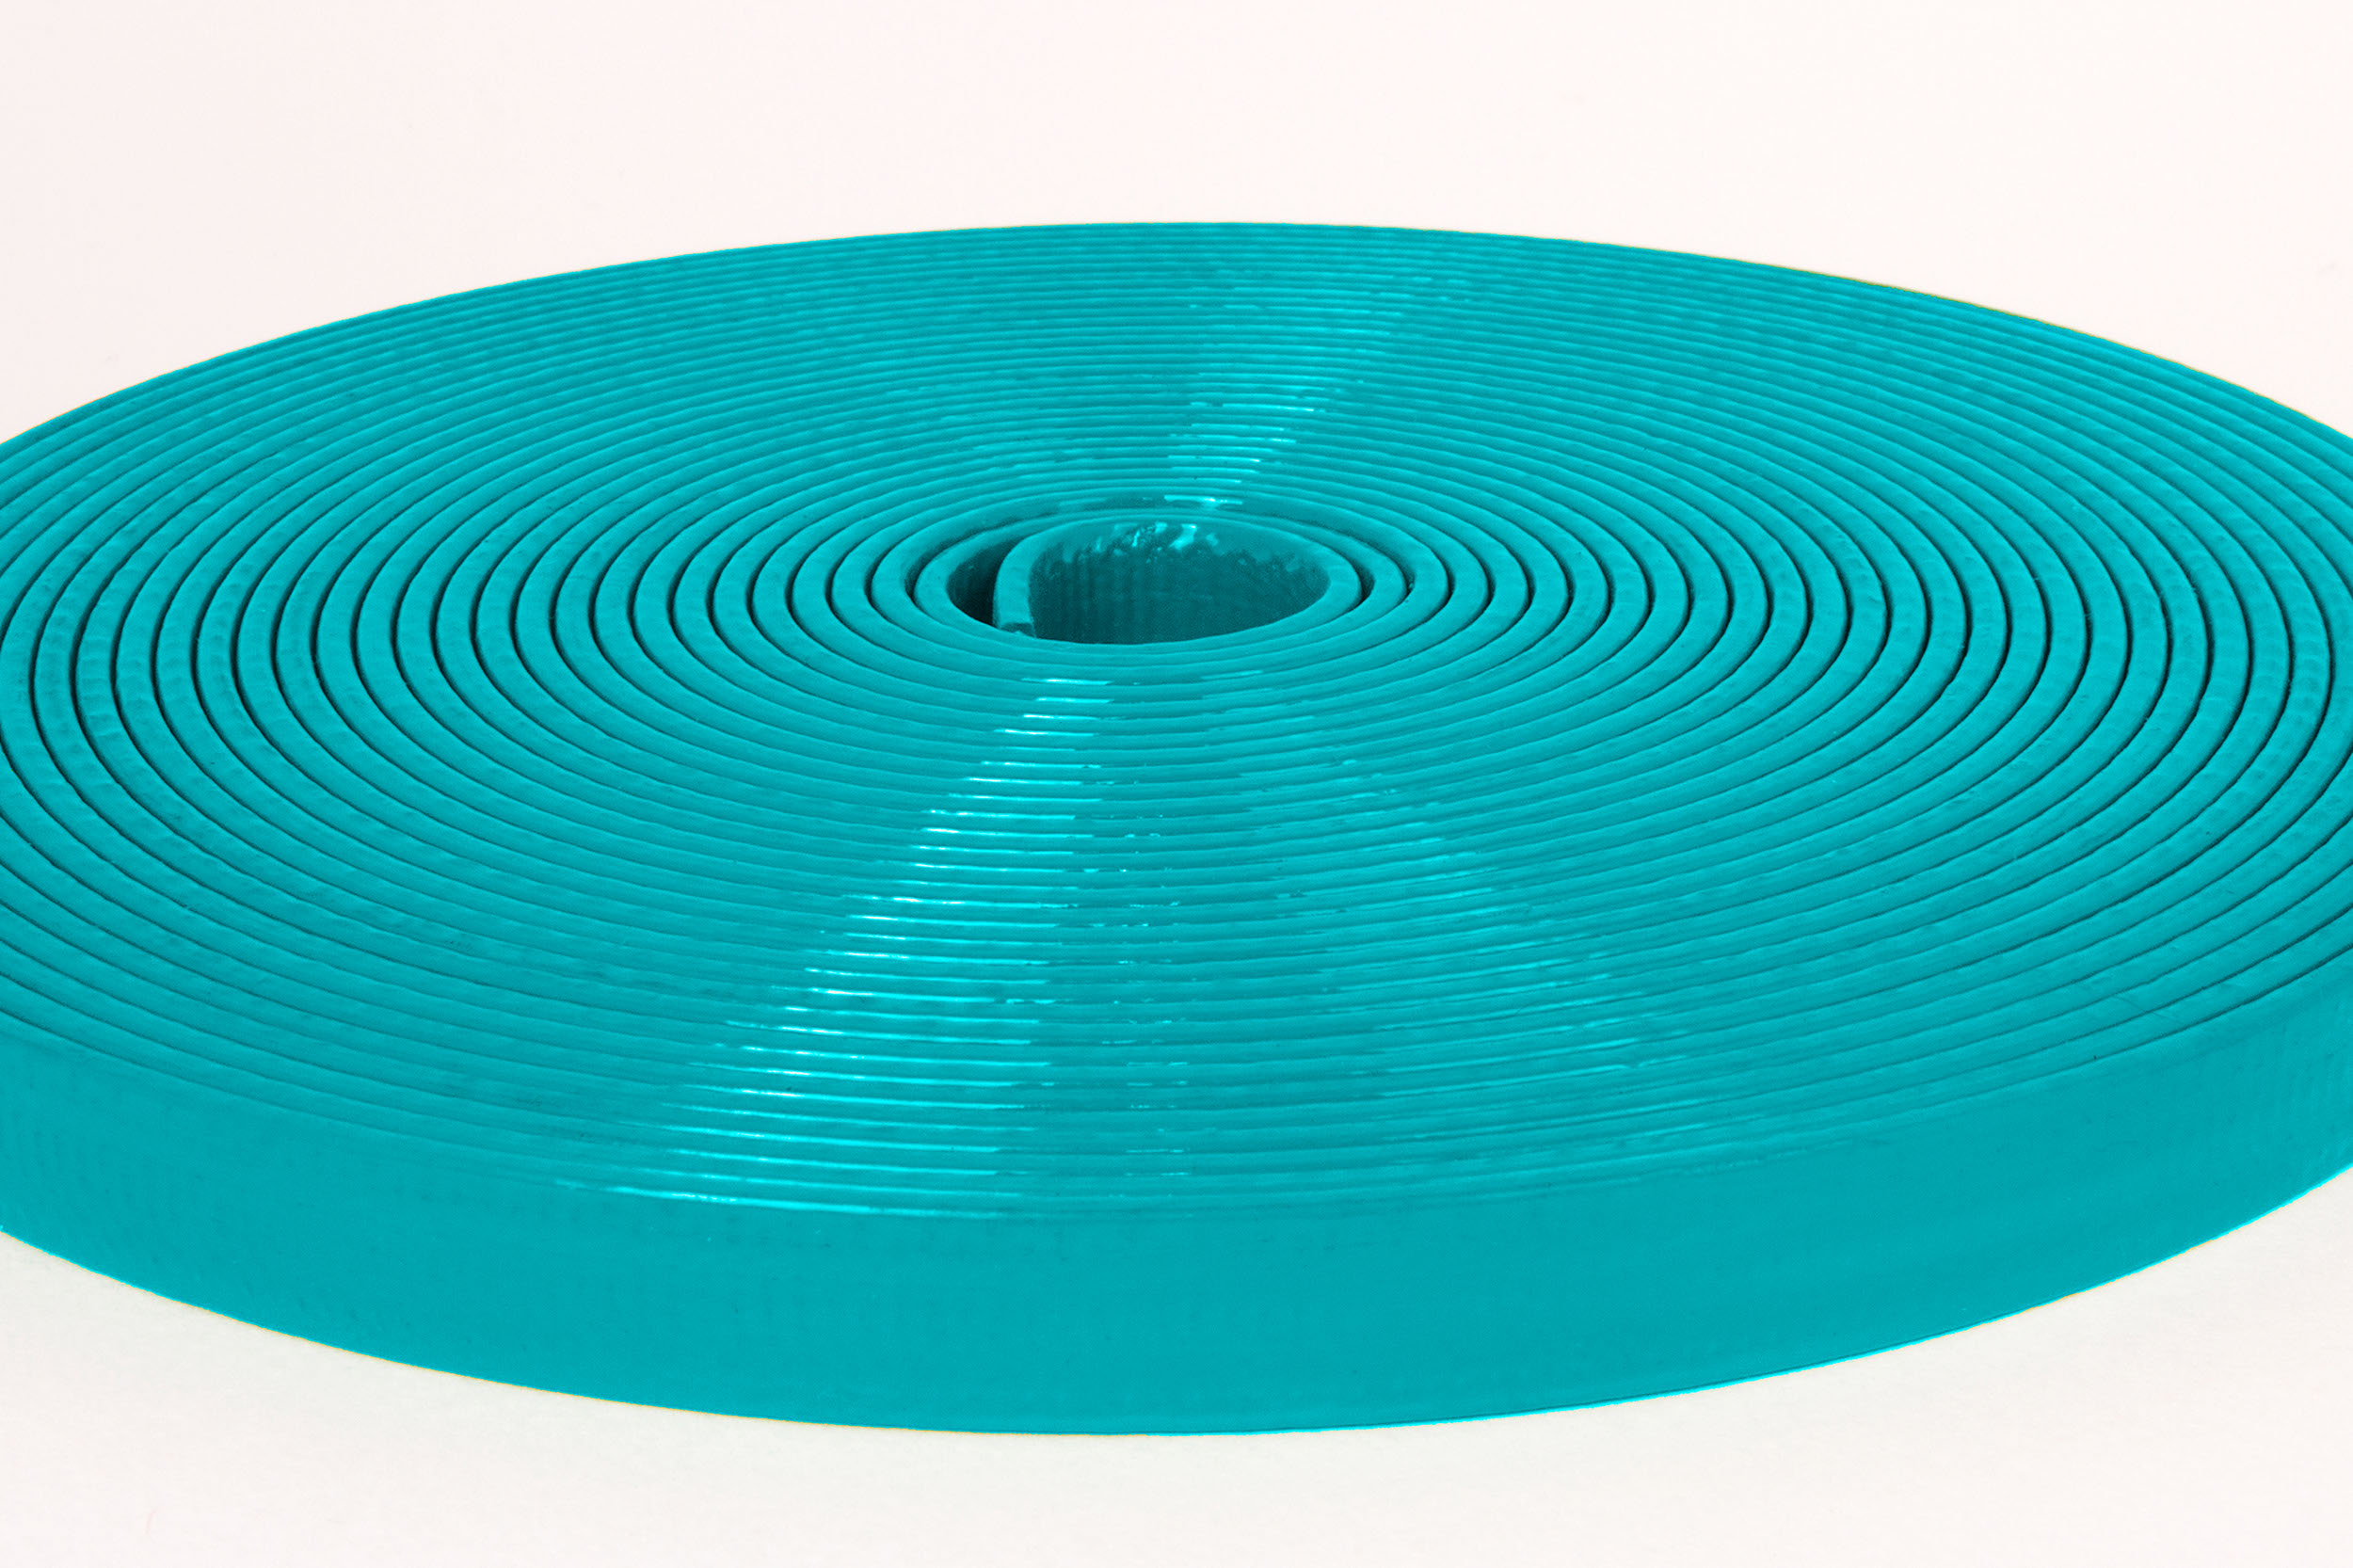 PVC-Coated-Webb12mm-Turquoise 01.jpg